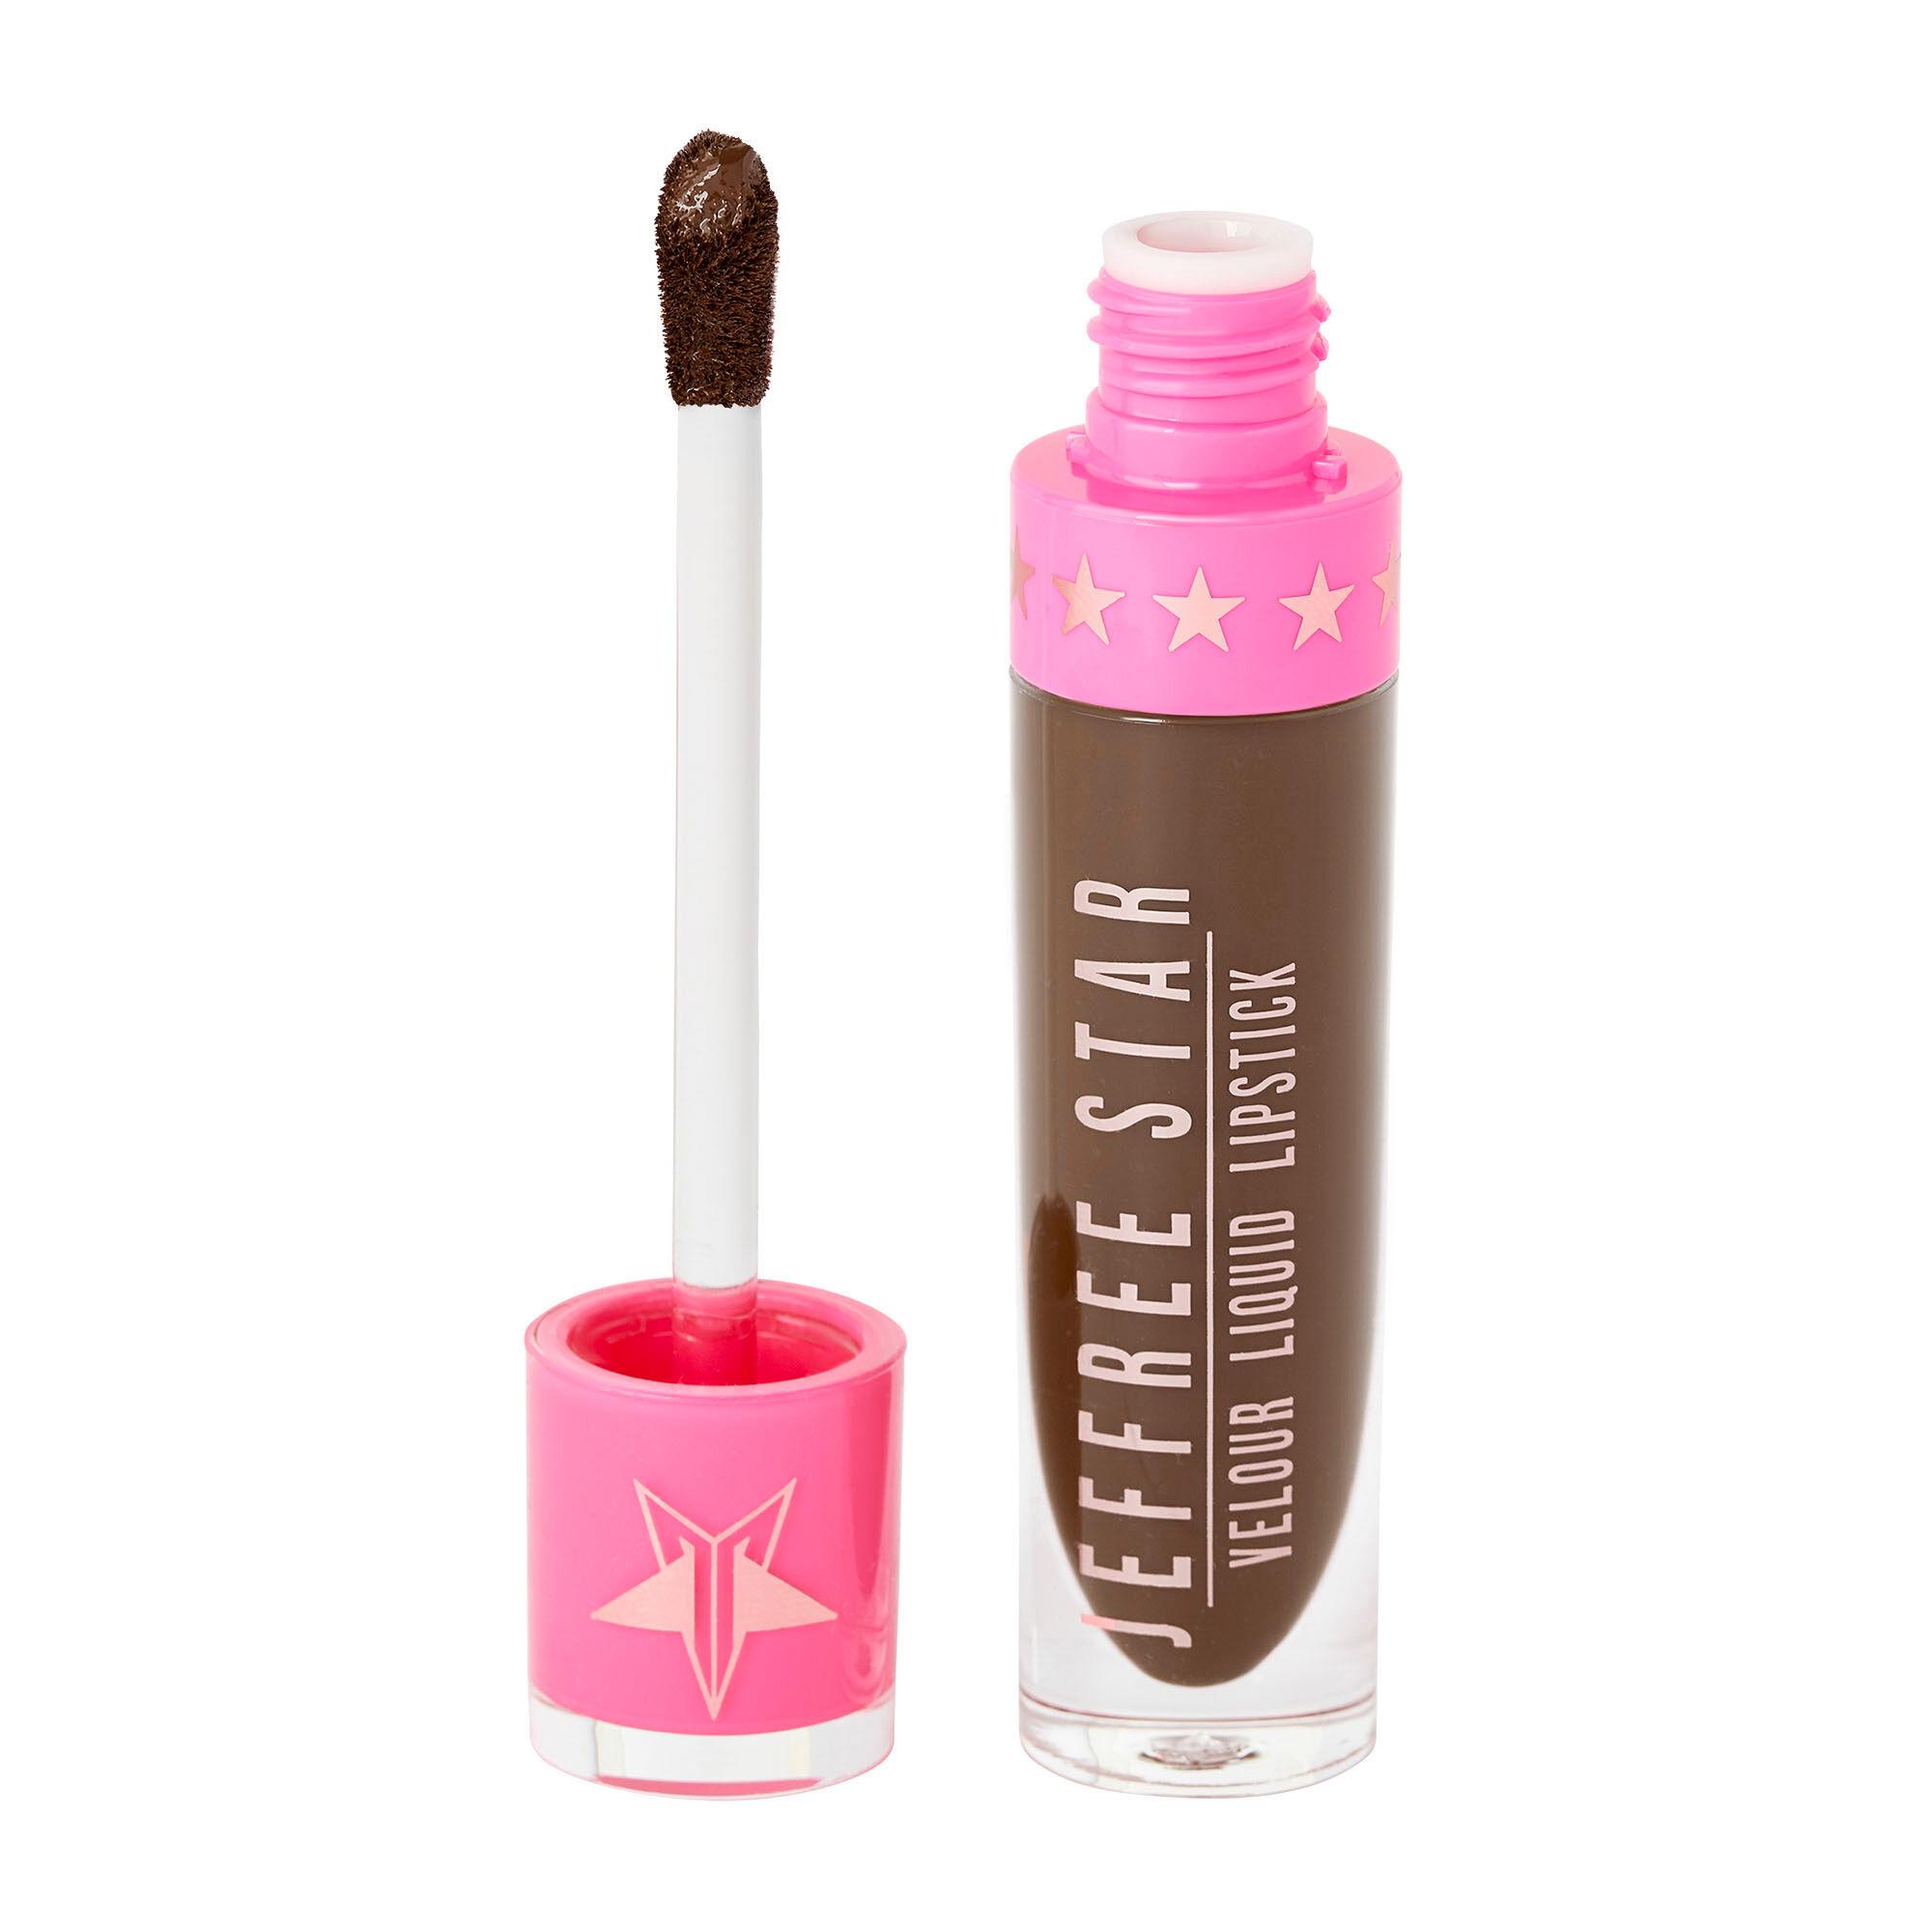 Jeffree Star Cosmetics Velour Liquid Lipstick Dominatrix 5.4ml